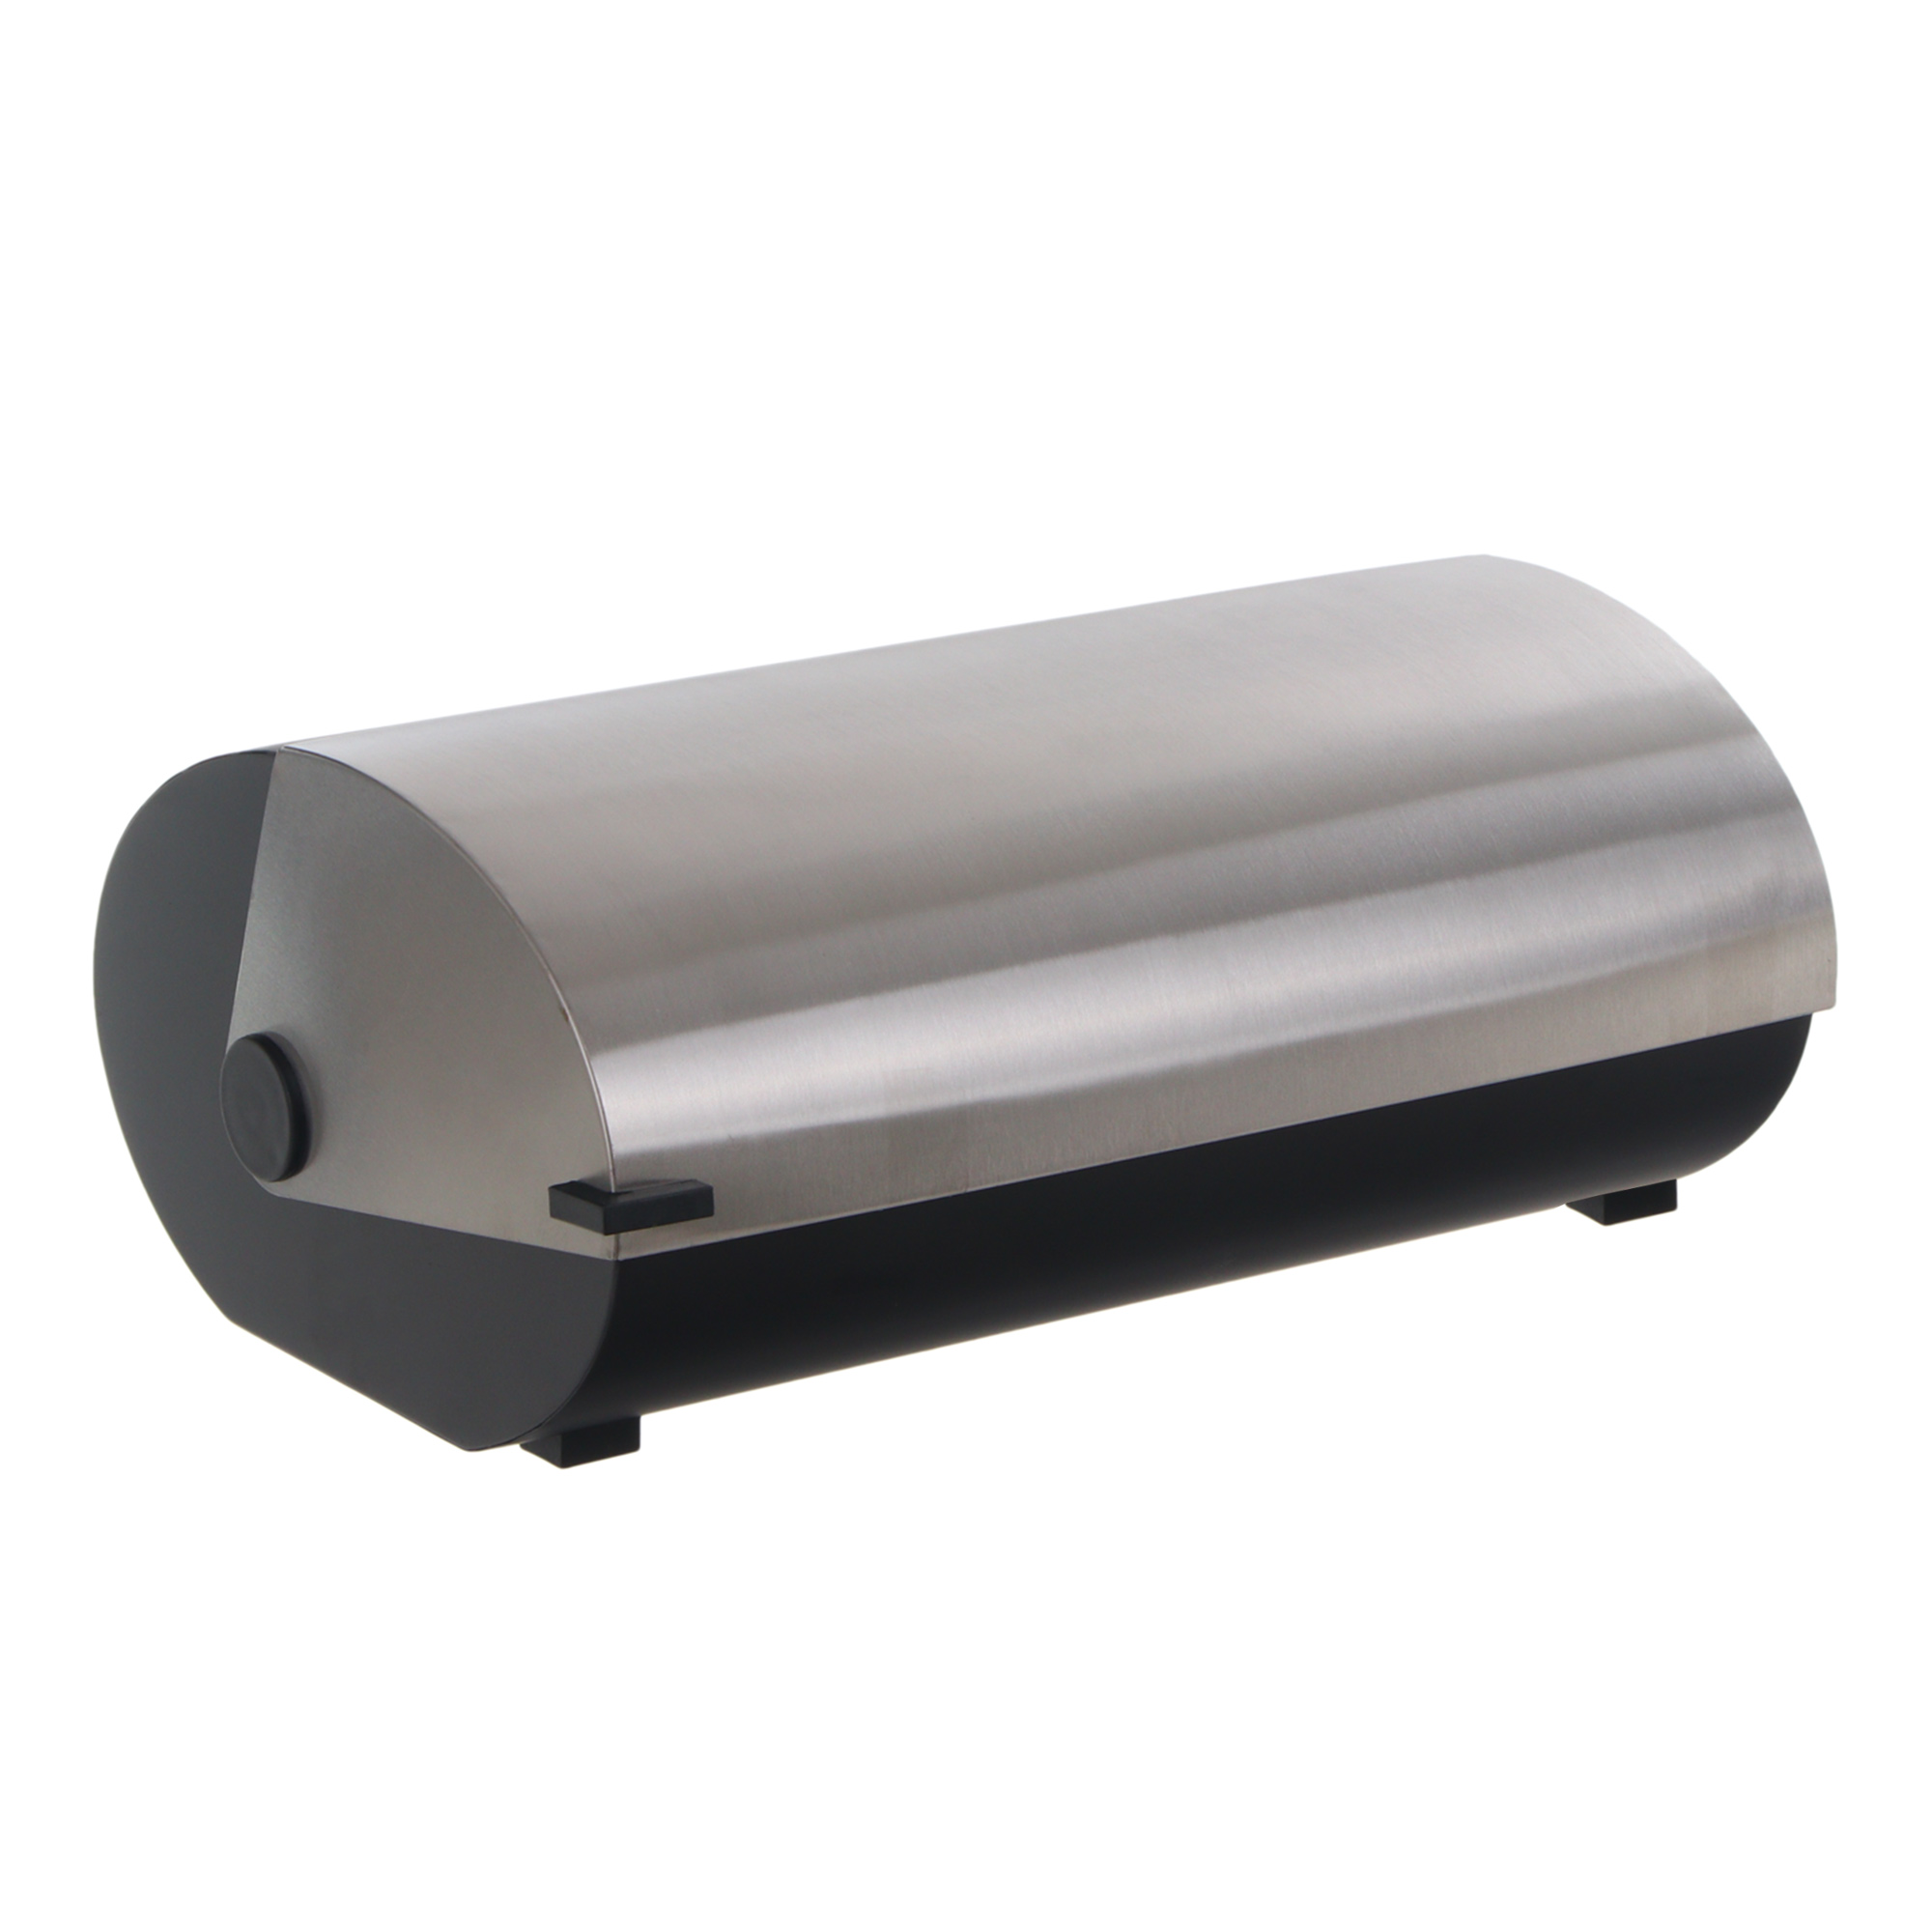 Хлебница Zeller пластик/металл недорого